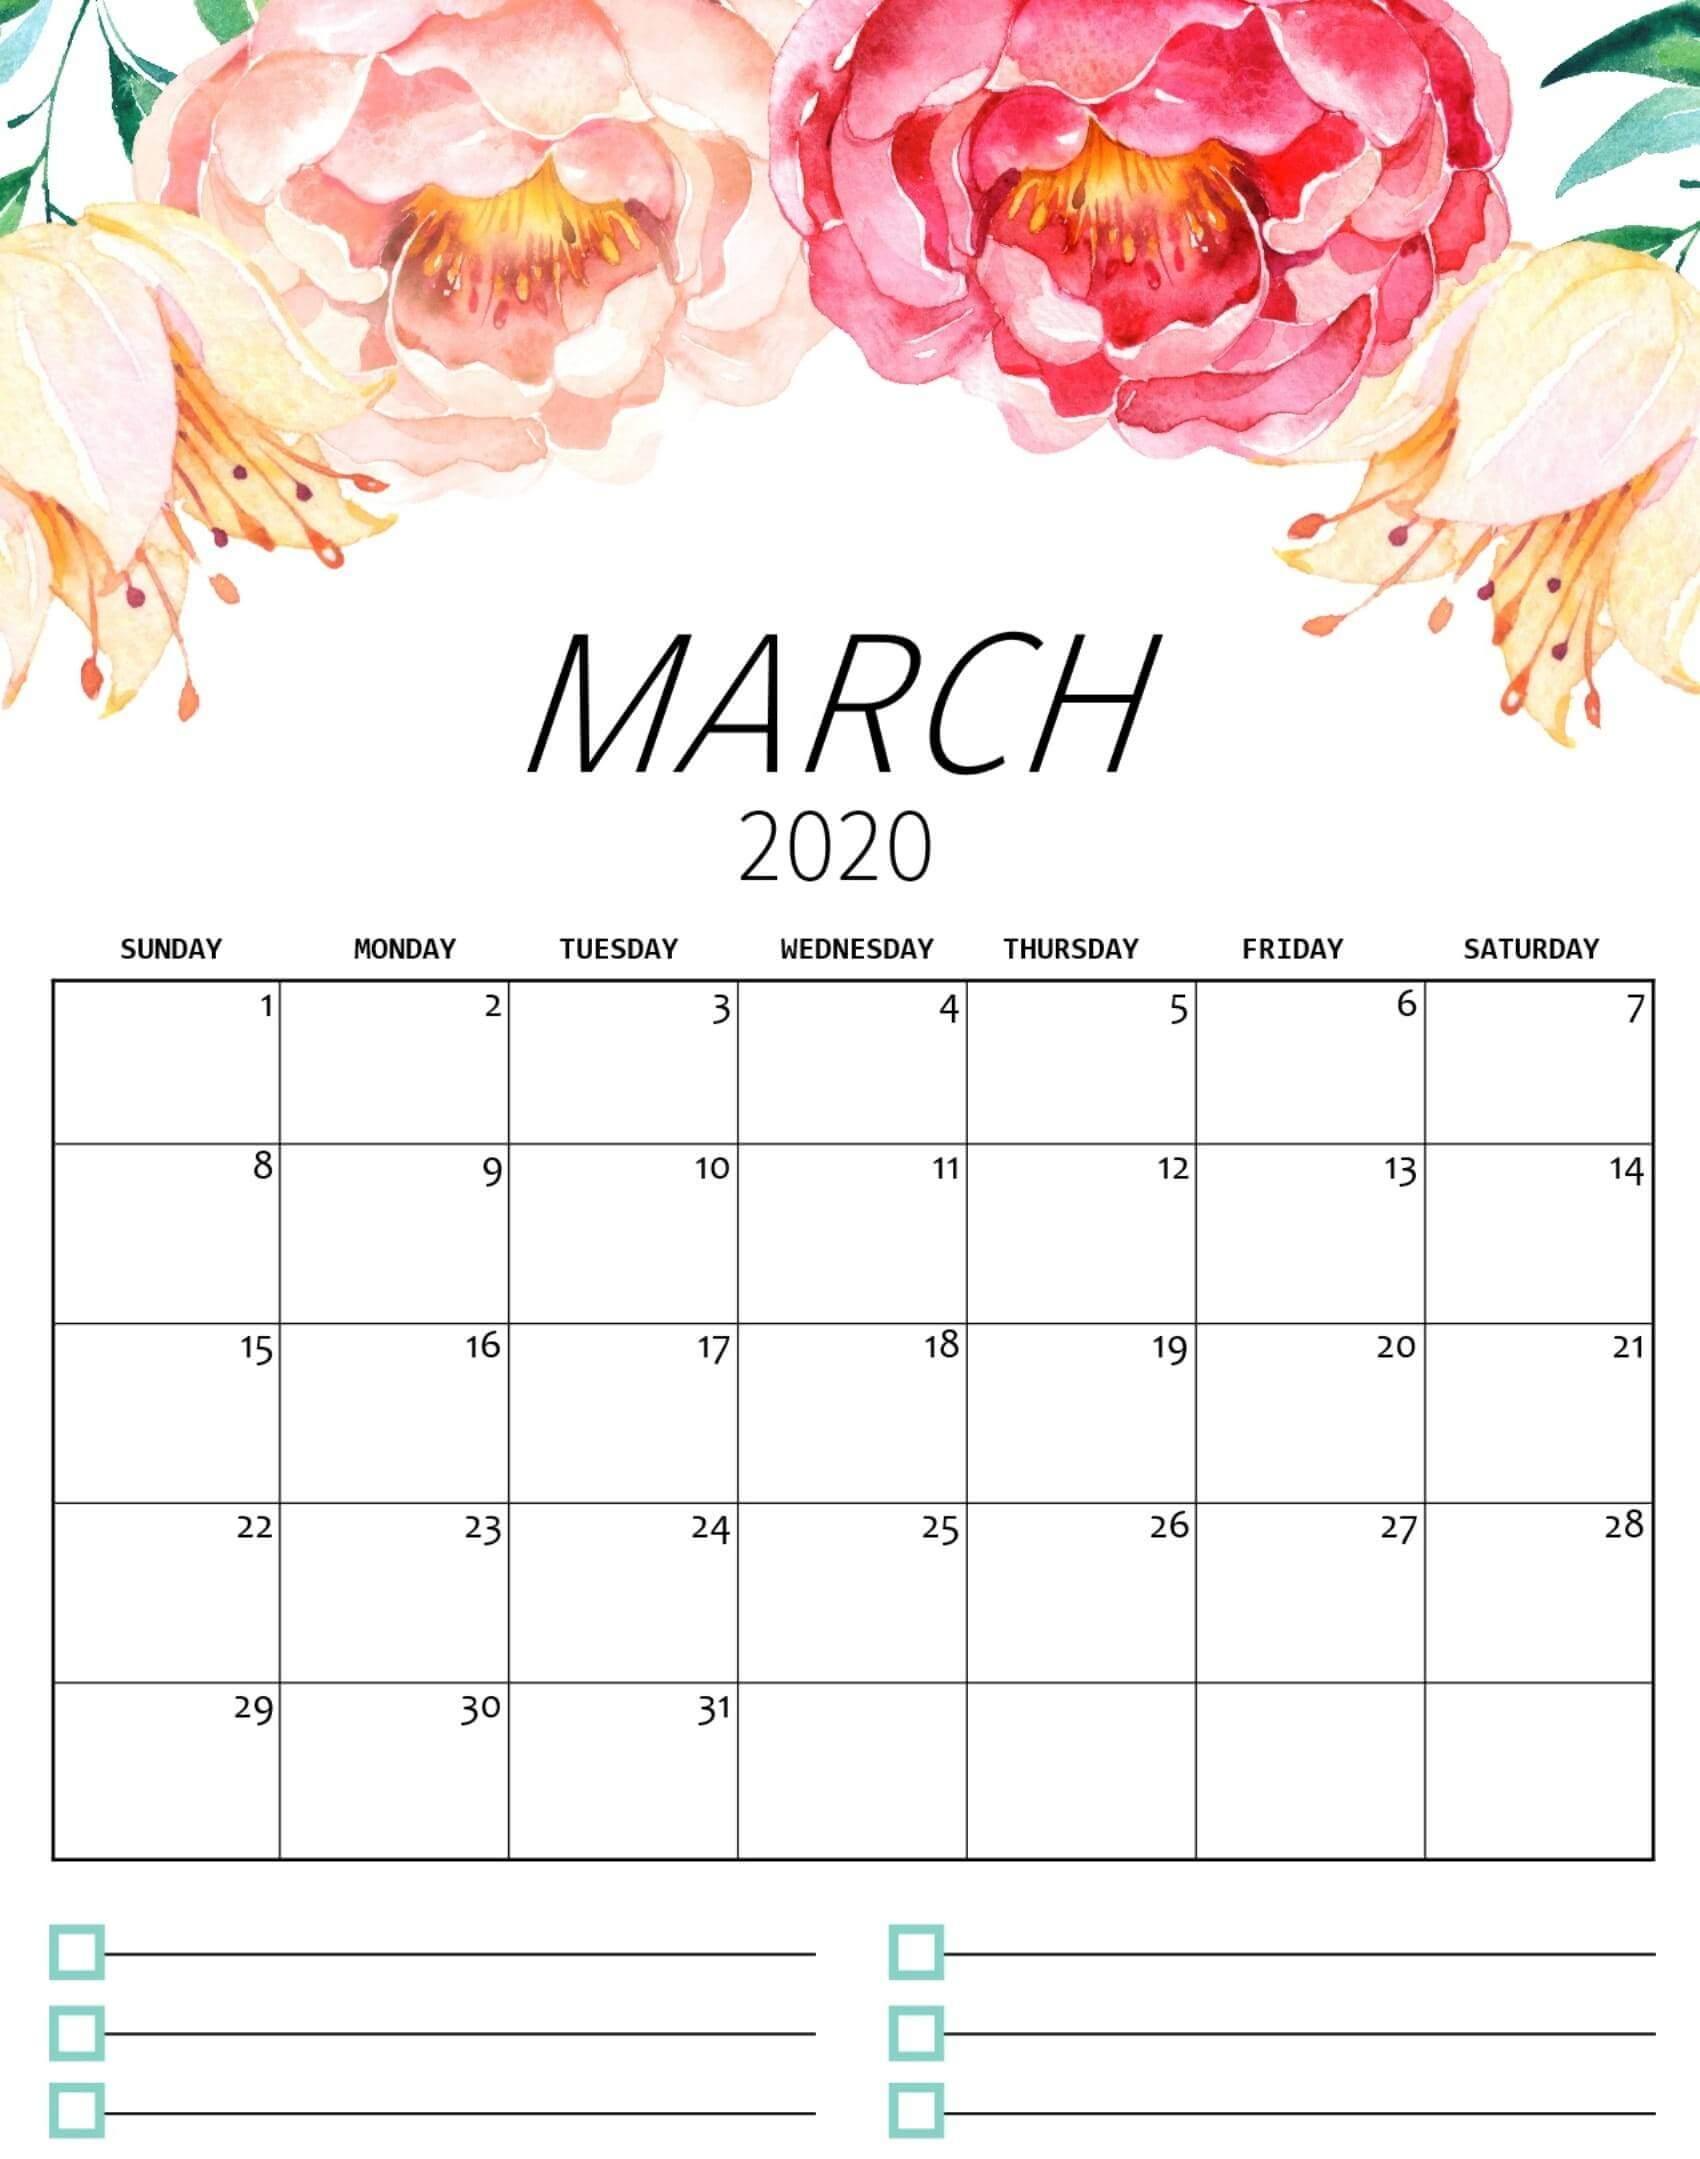 Cute March 2020 Floral Calendar